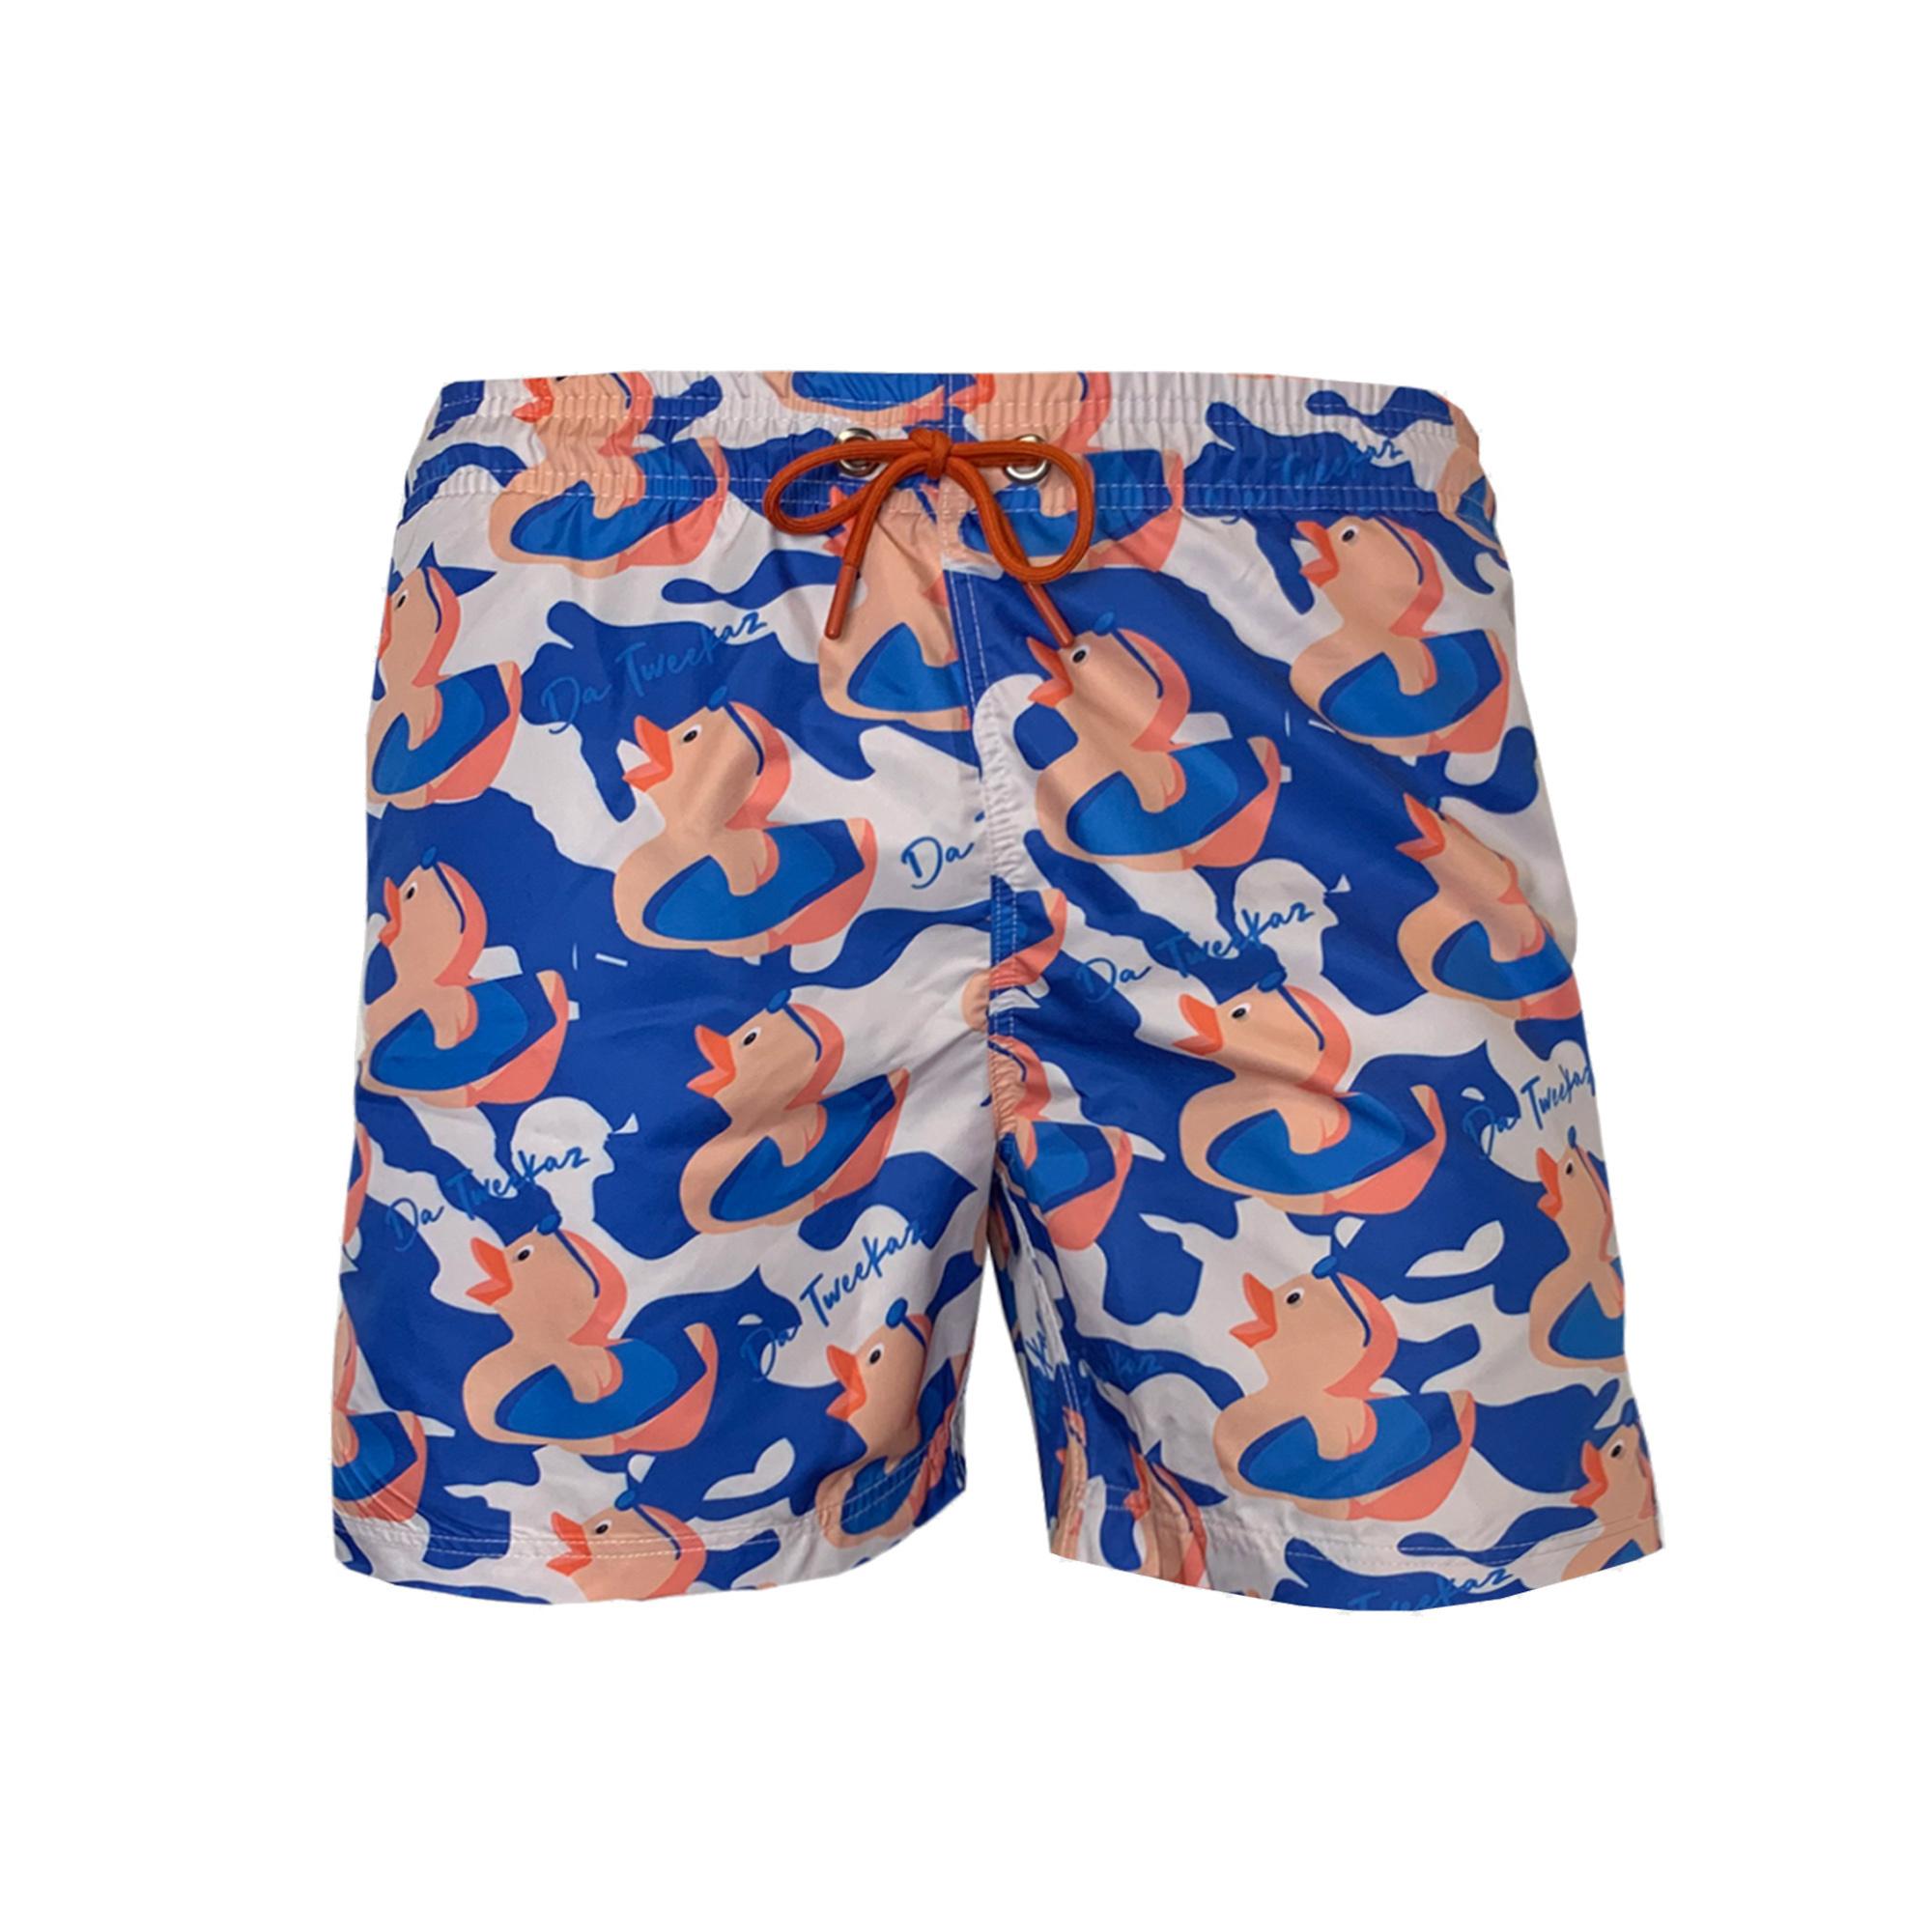 Summer Pack - Surfer Duck Swim Shorts